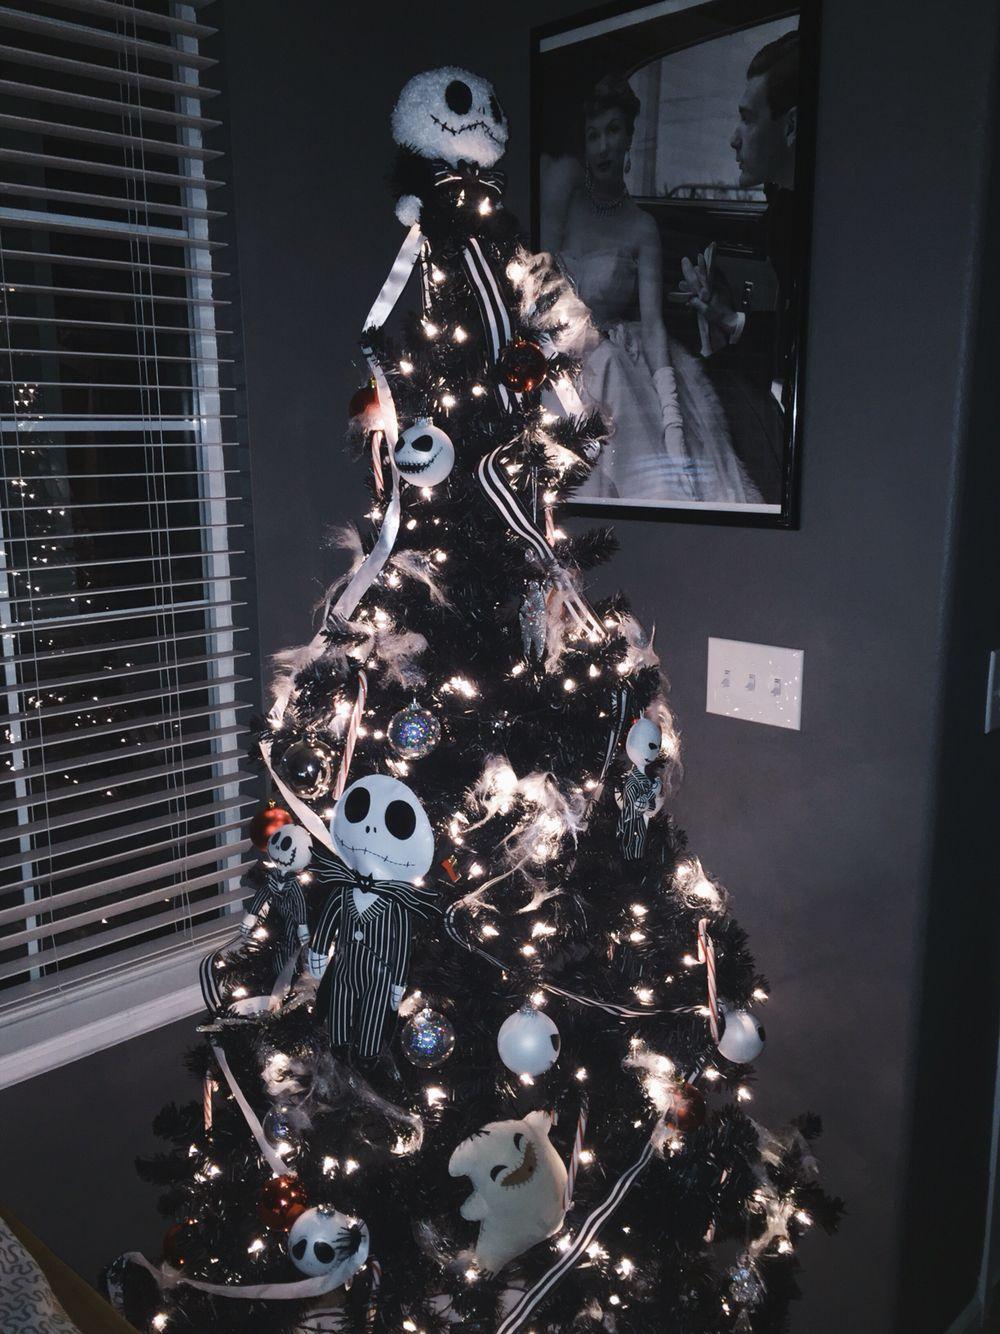 The Nightmare Before Christmas themed Christmas tree